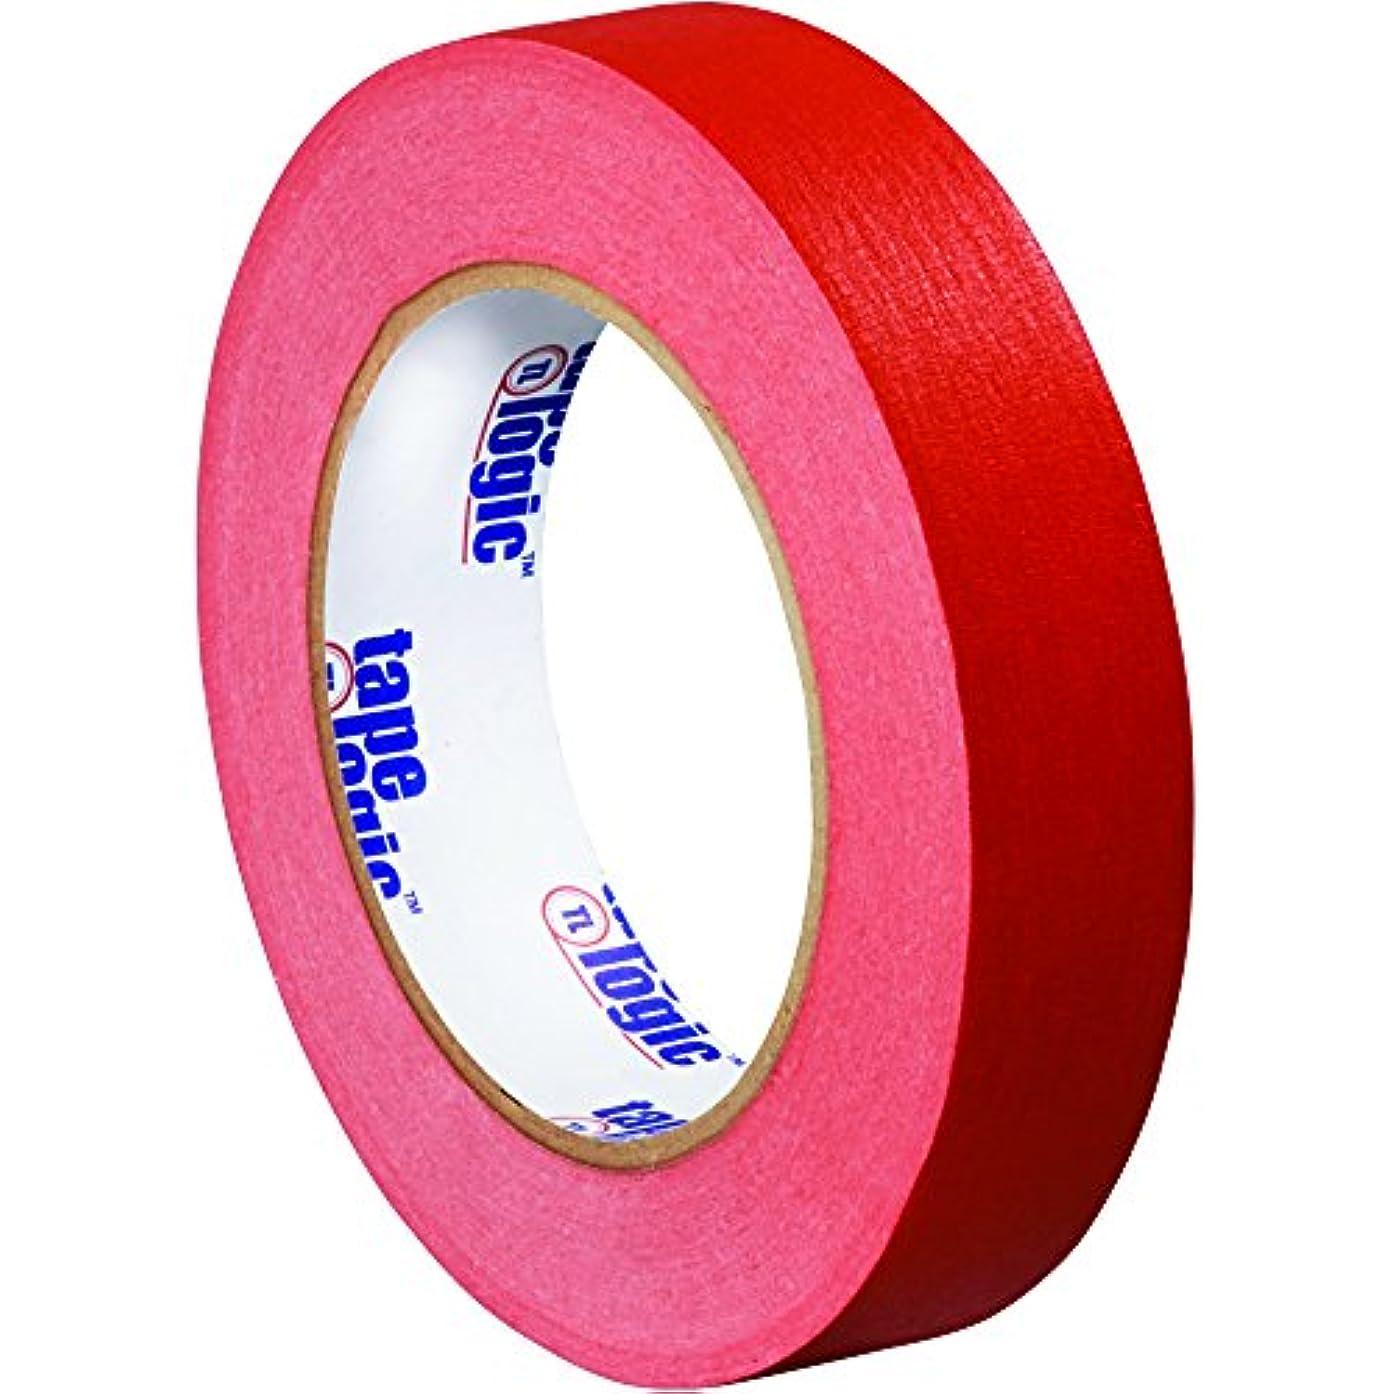 Partners Brand PT935003R Tape Logic Masking Tape, 1